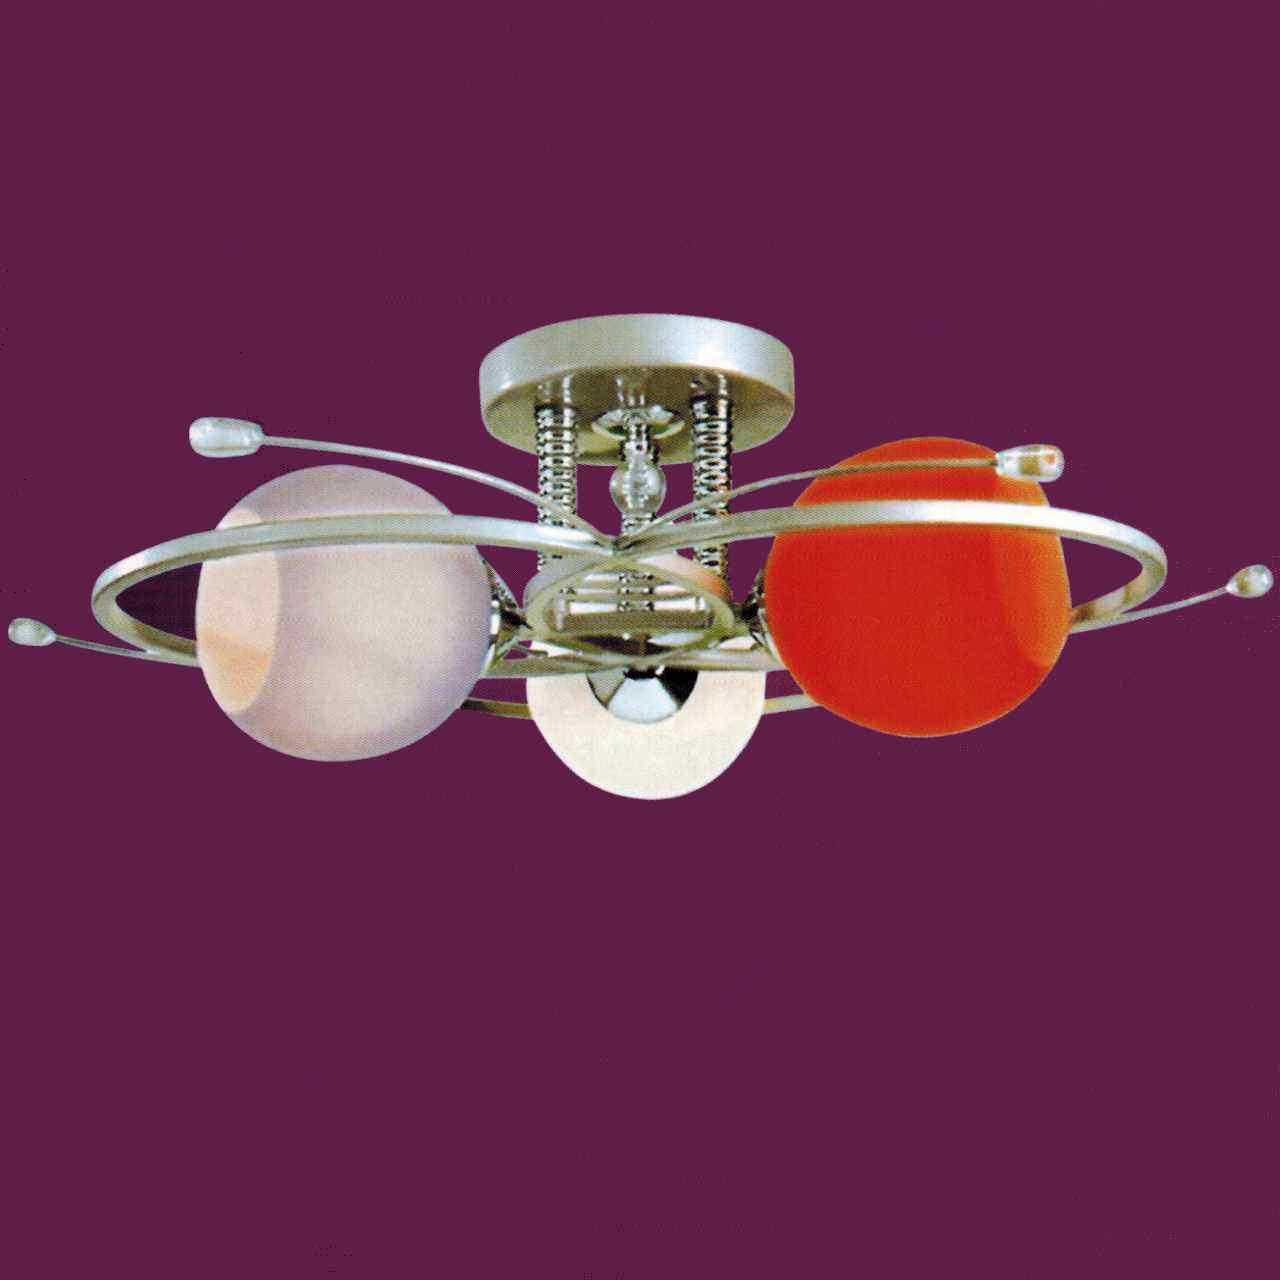 Brizzo lighting stores 24 vibrante modern round kids for Table vibrante